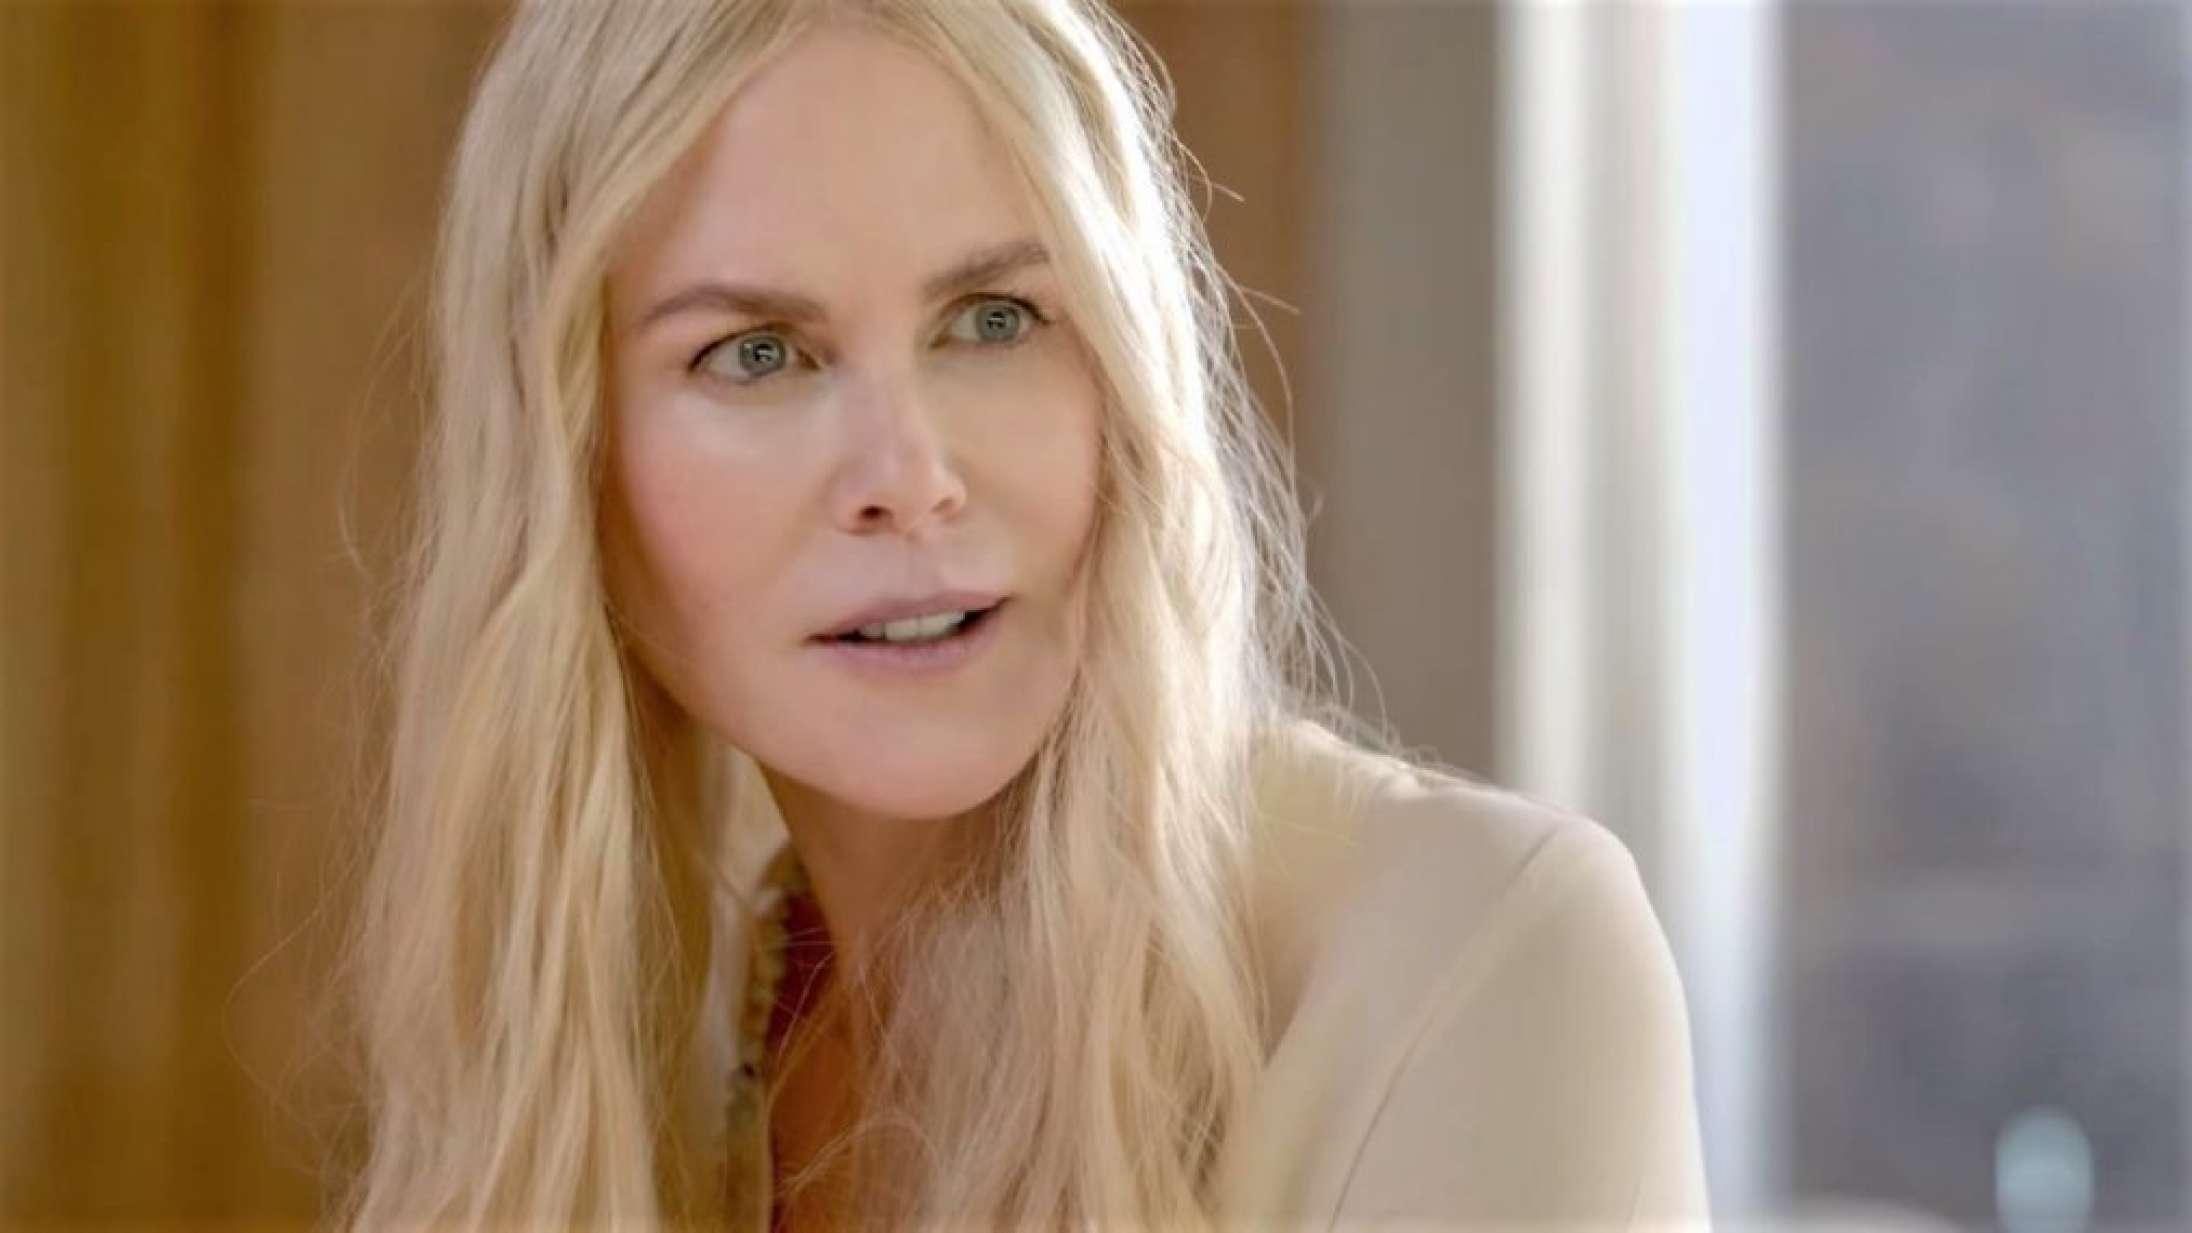 Holdet bag 'Big Little Lies' klar med creepy dramaserie: Se traileren til 'Nine Perfect Strangers' med Nicole Kidman